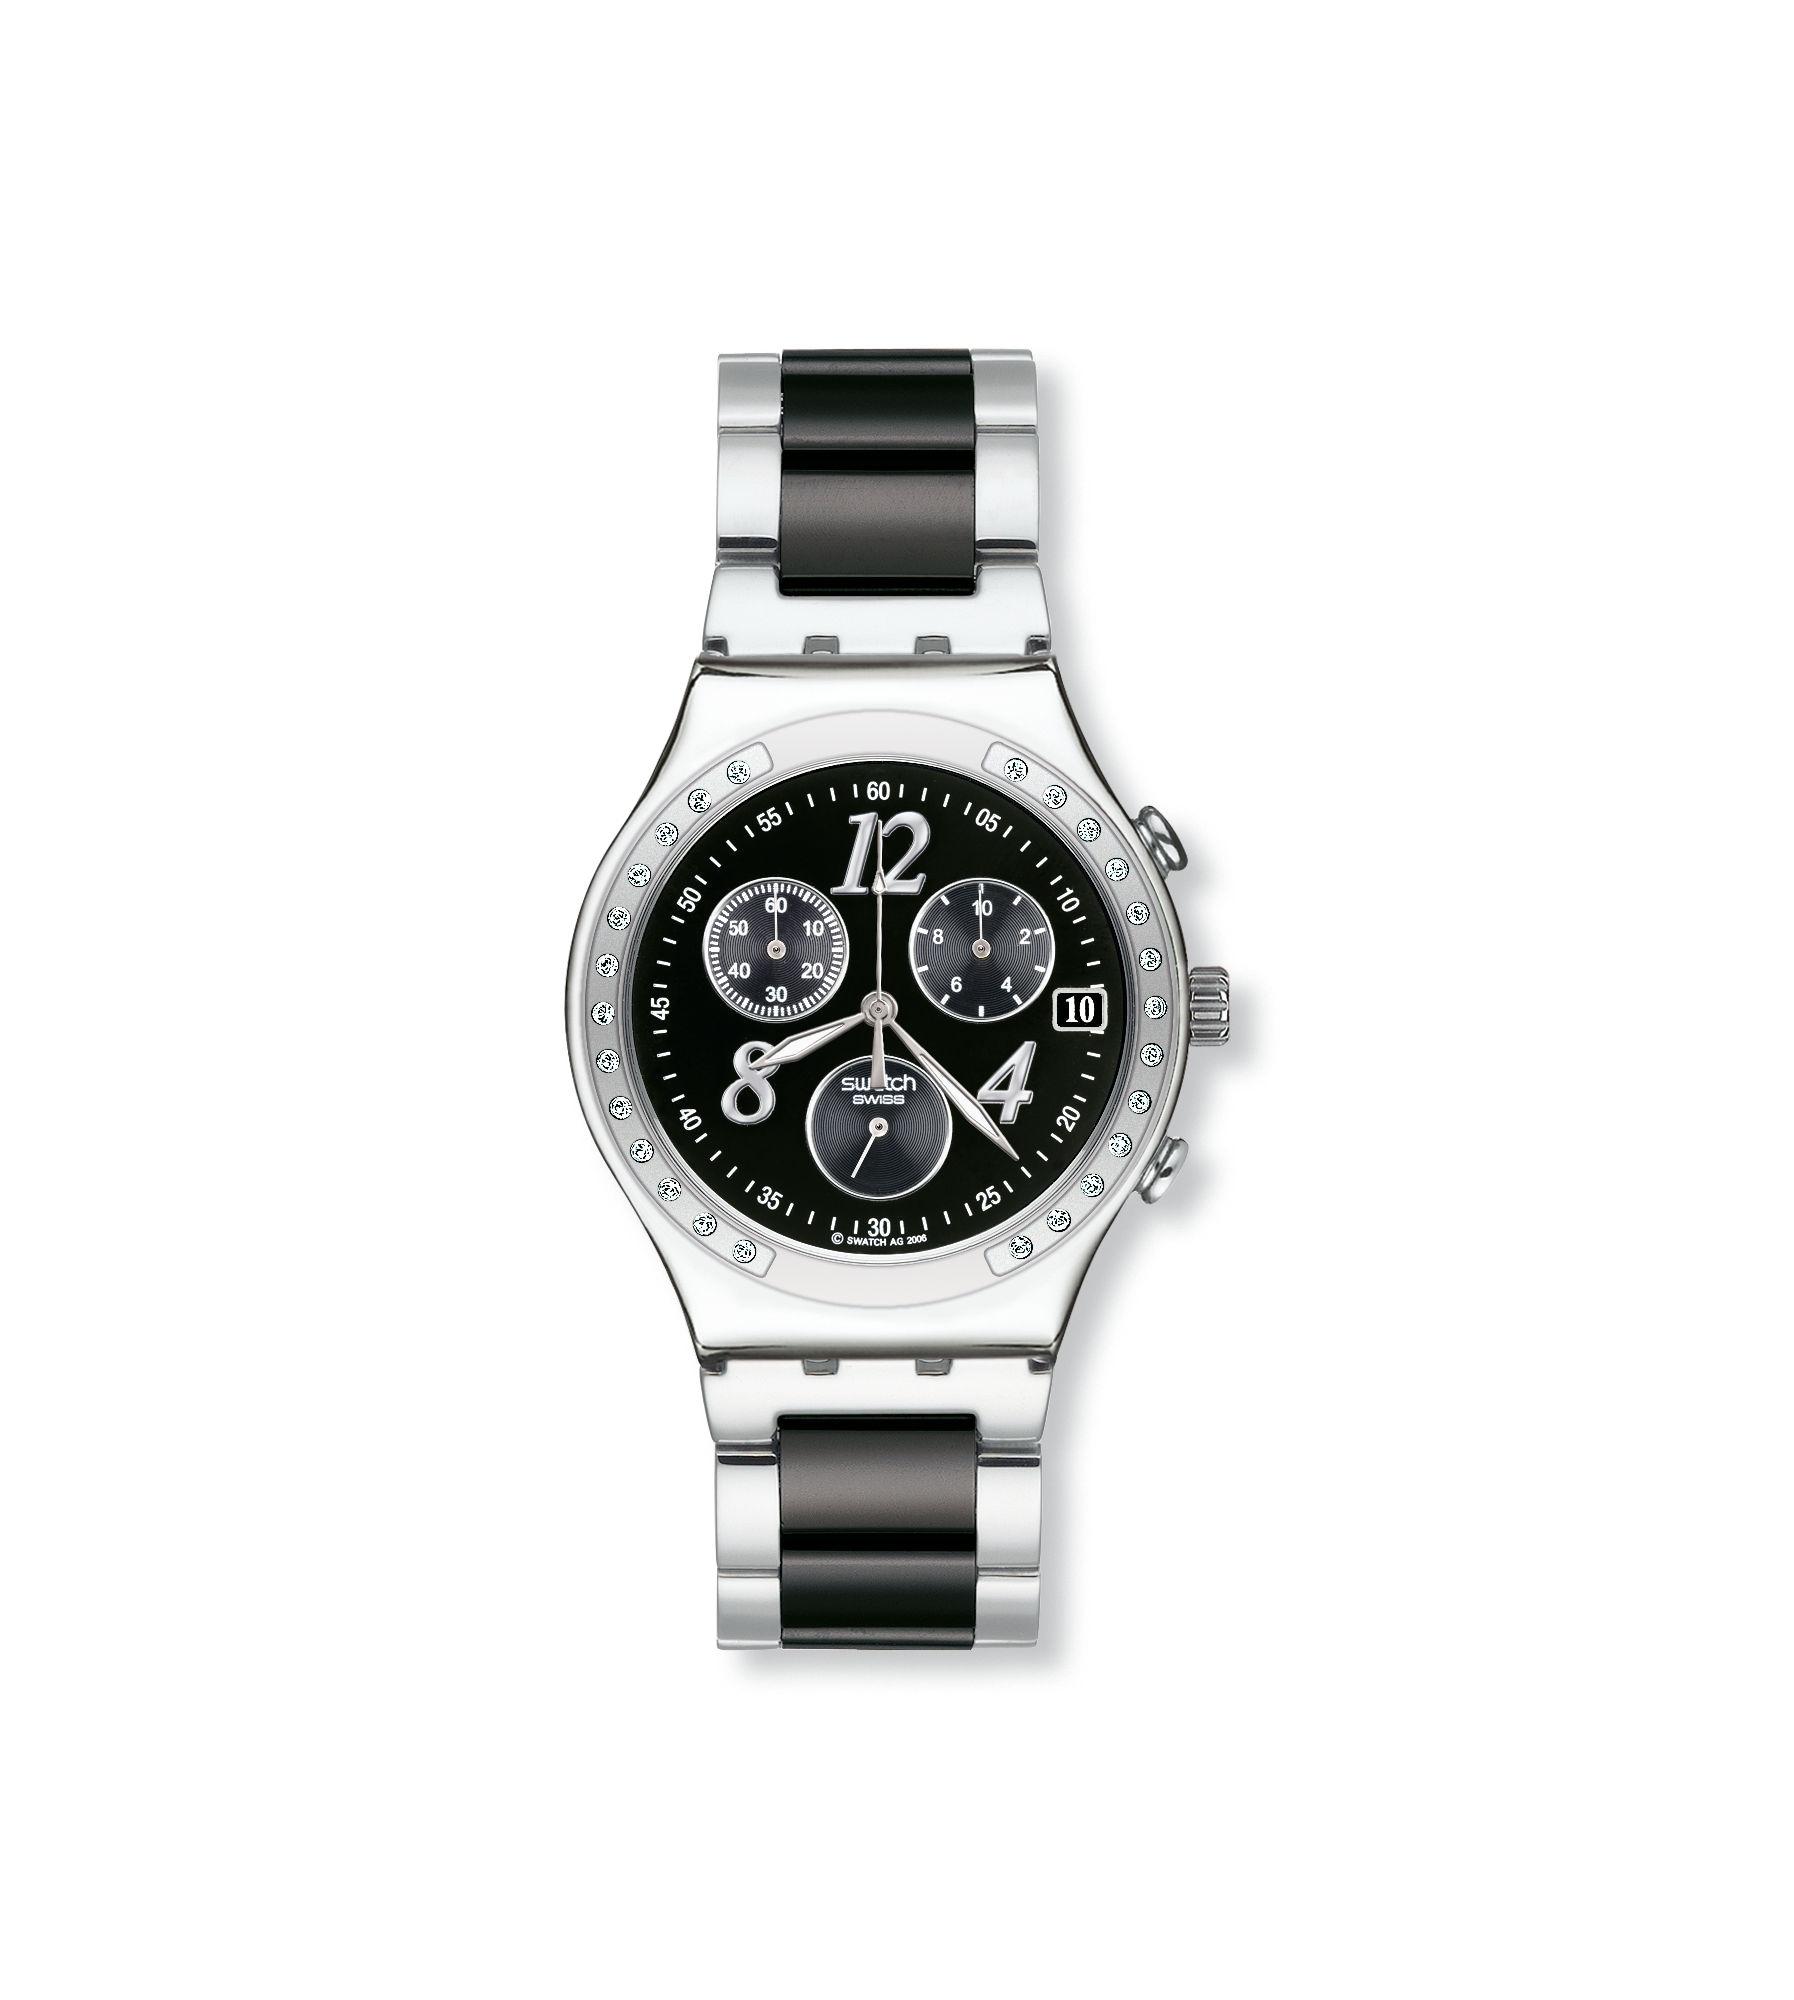 Chronoø 40 Argentina 47 Ycs485gc MmDreamnight Swatch® BredCxo